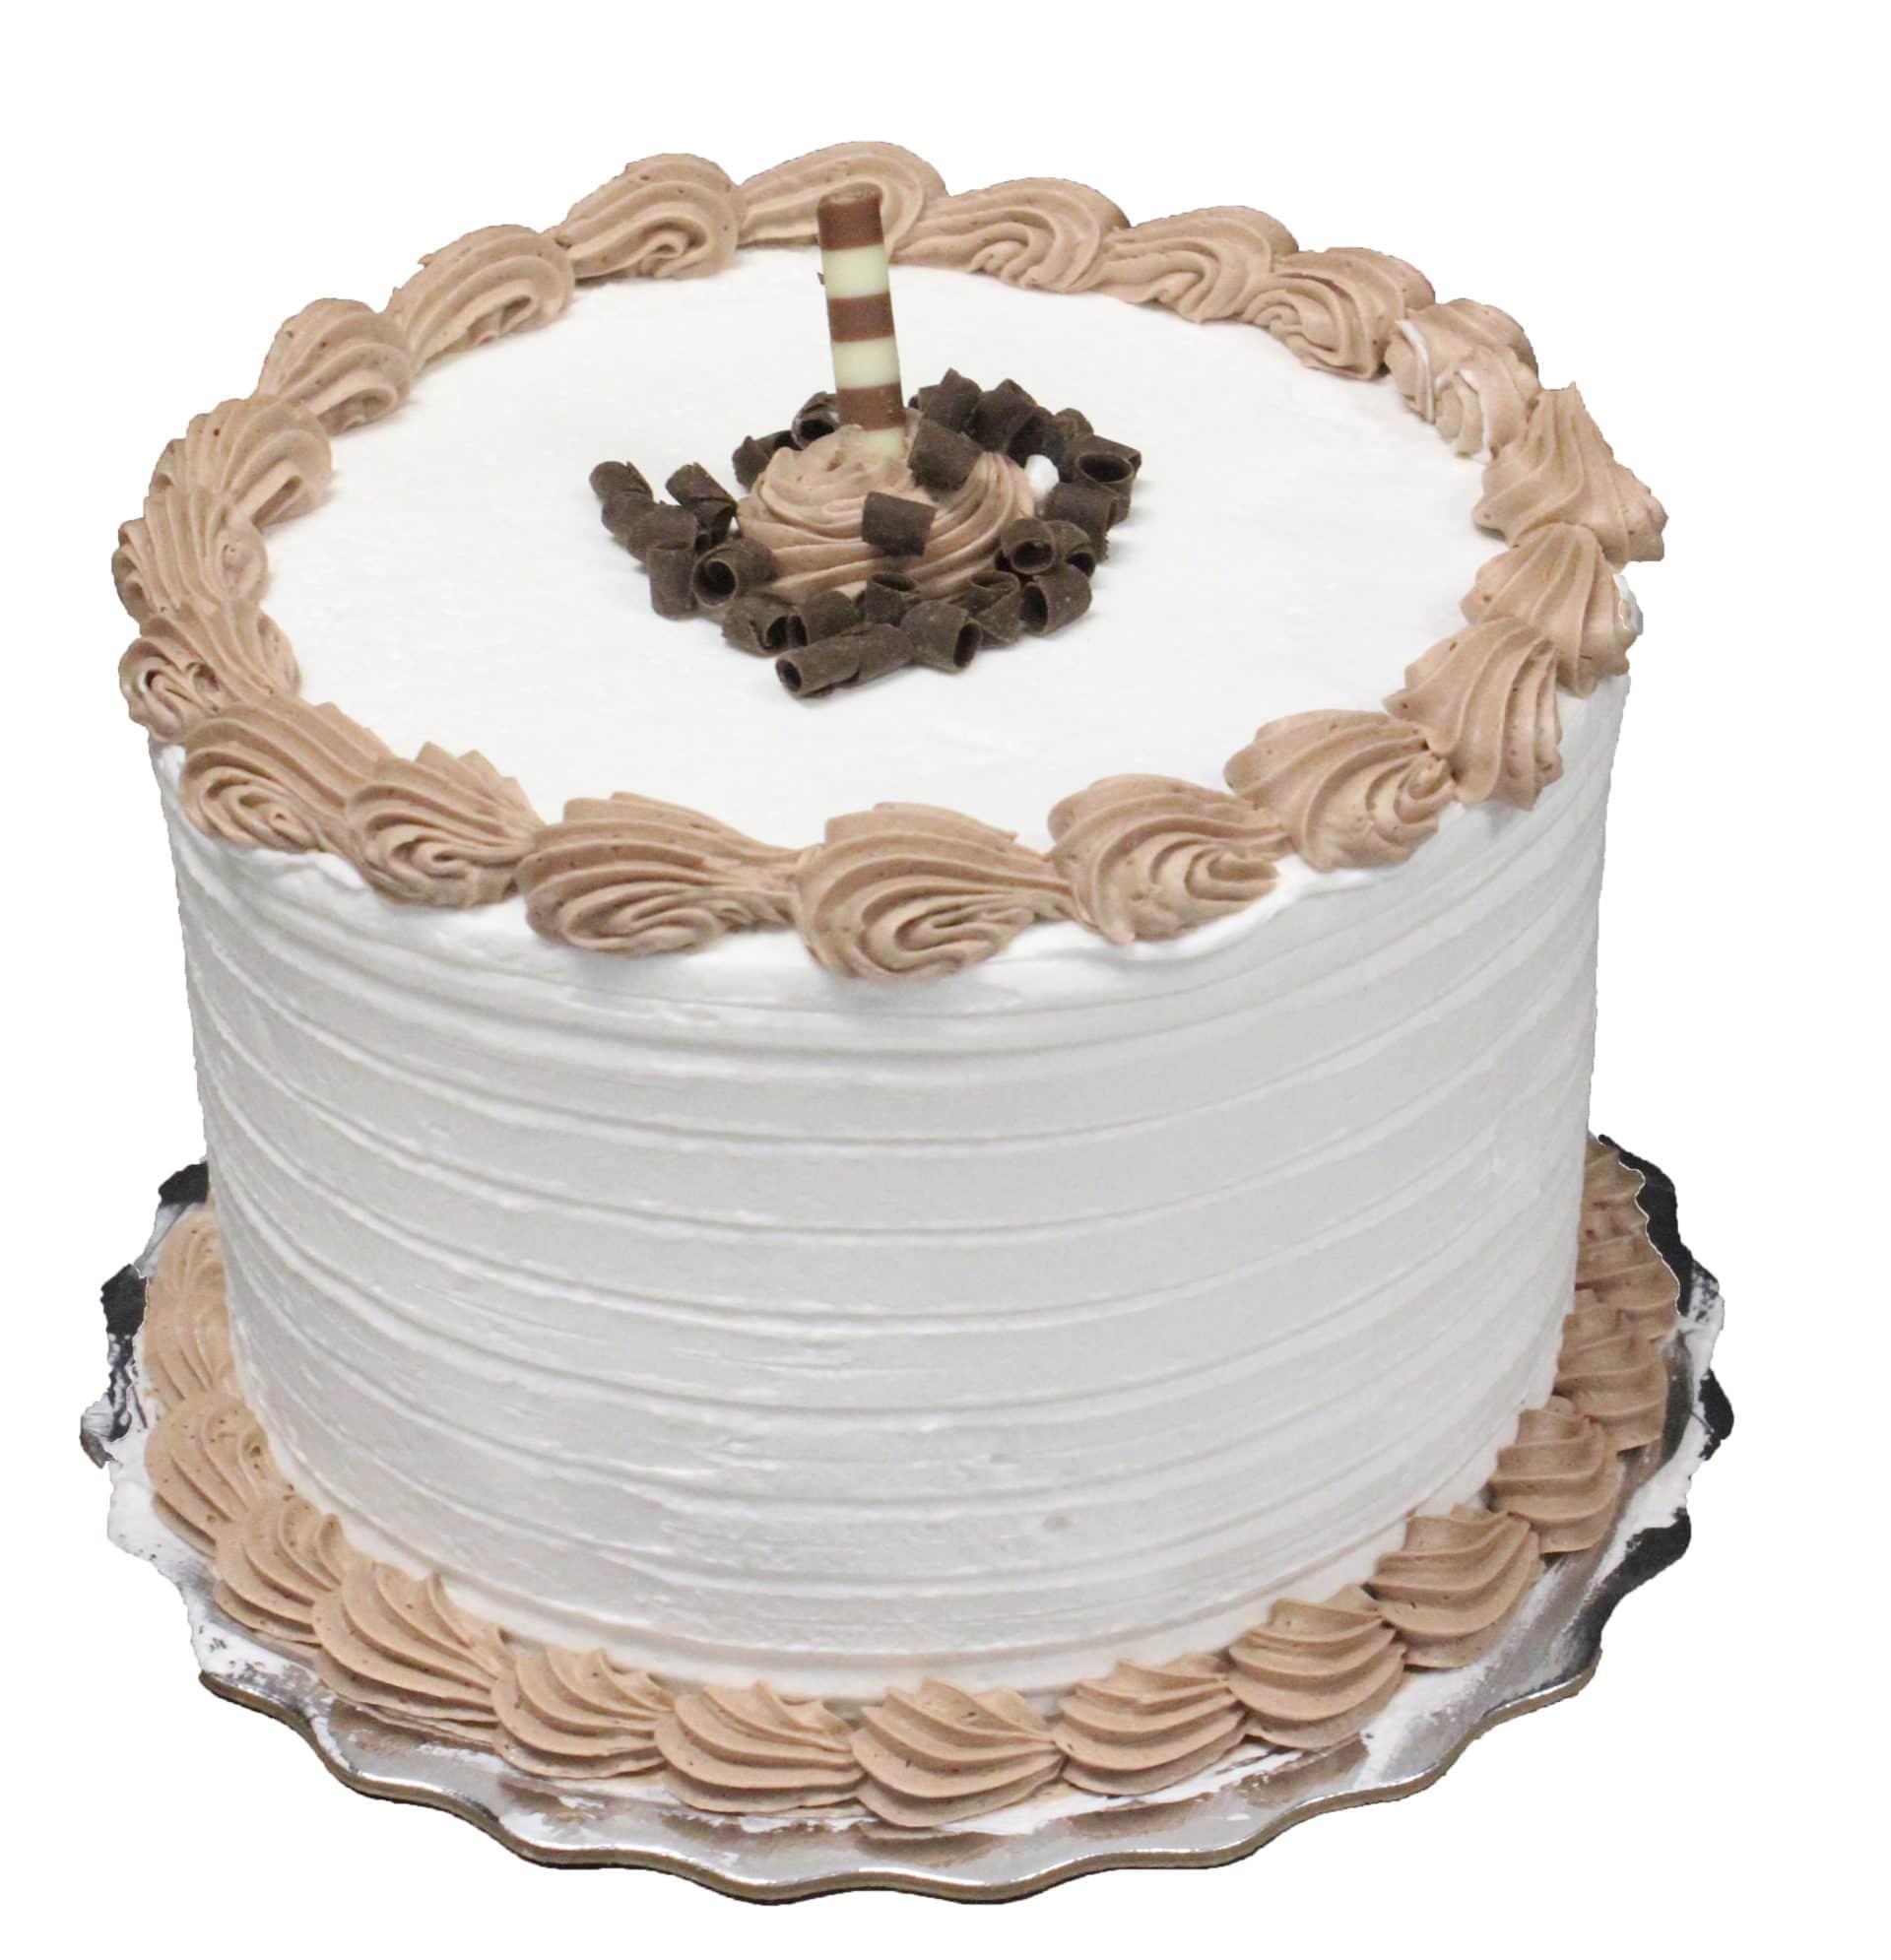 Marble French Cream Dessert Cake